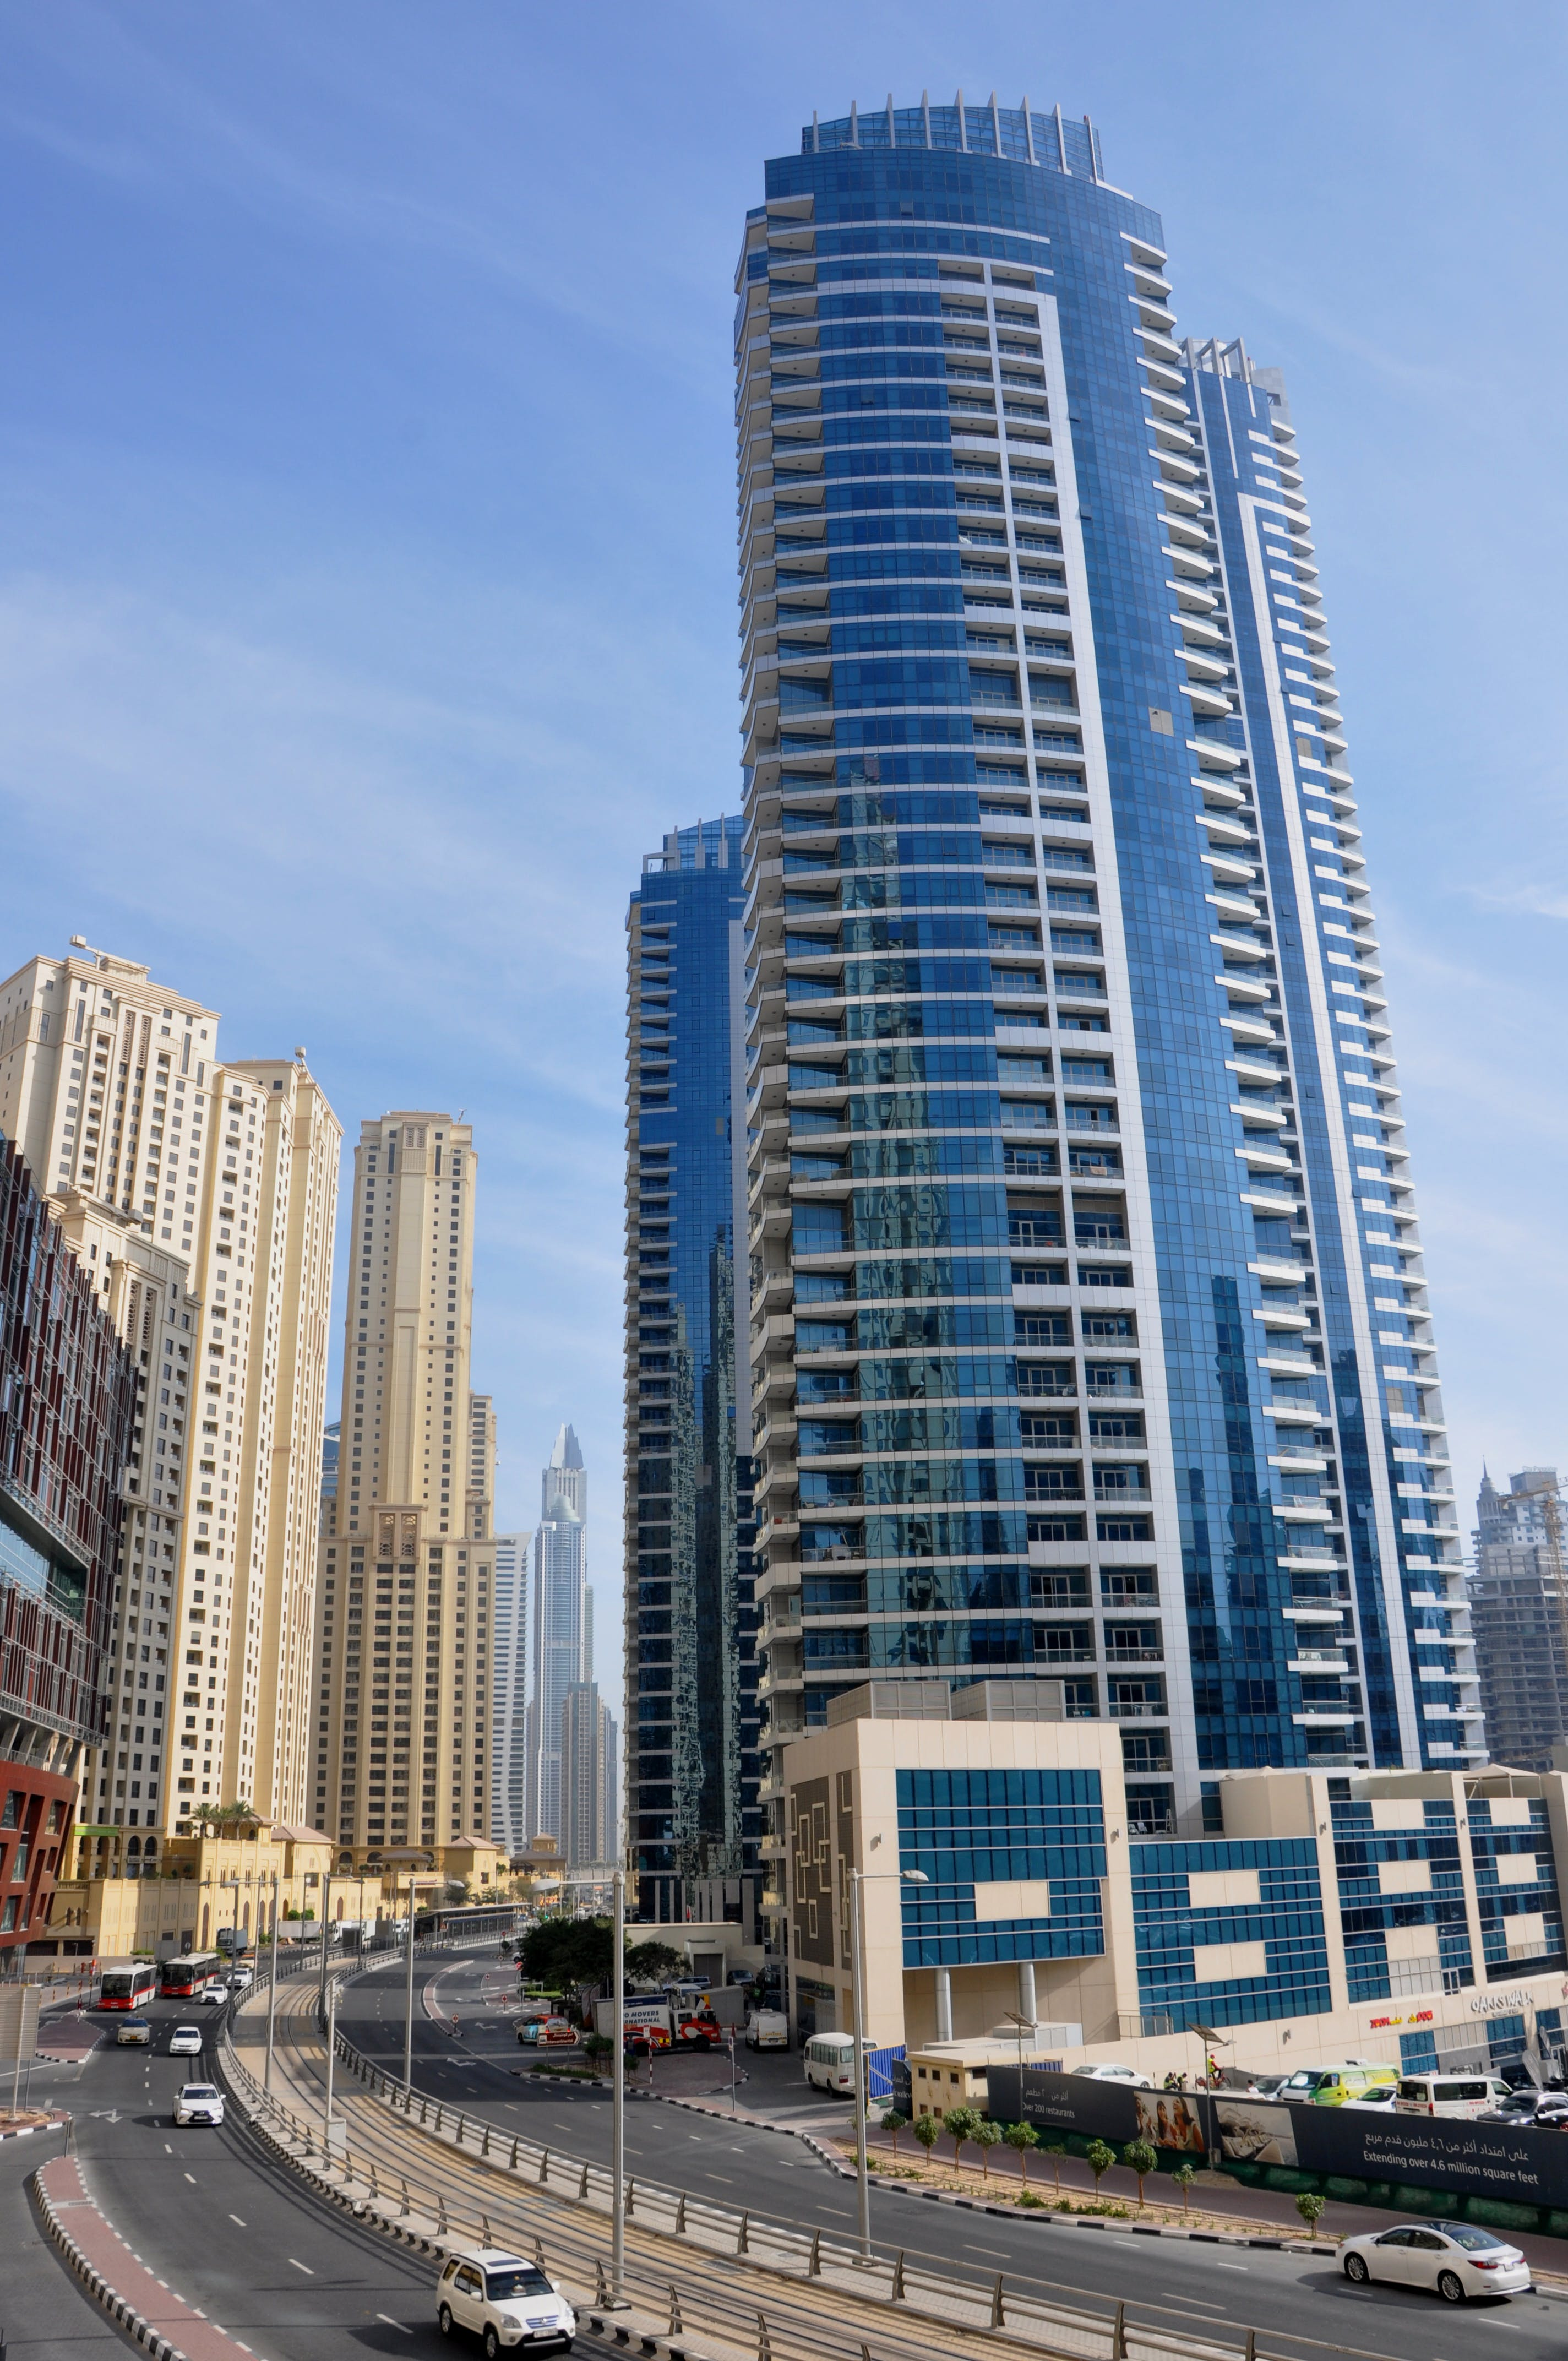 Free stock photo of big city, building, Dubai Marina